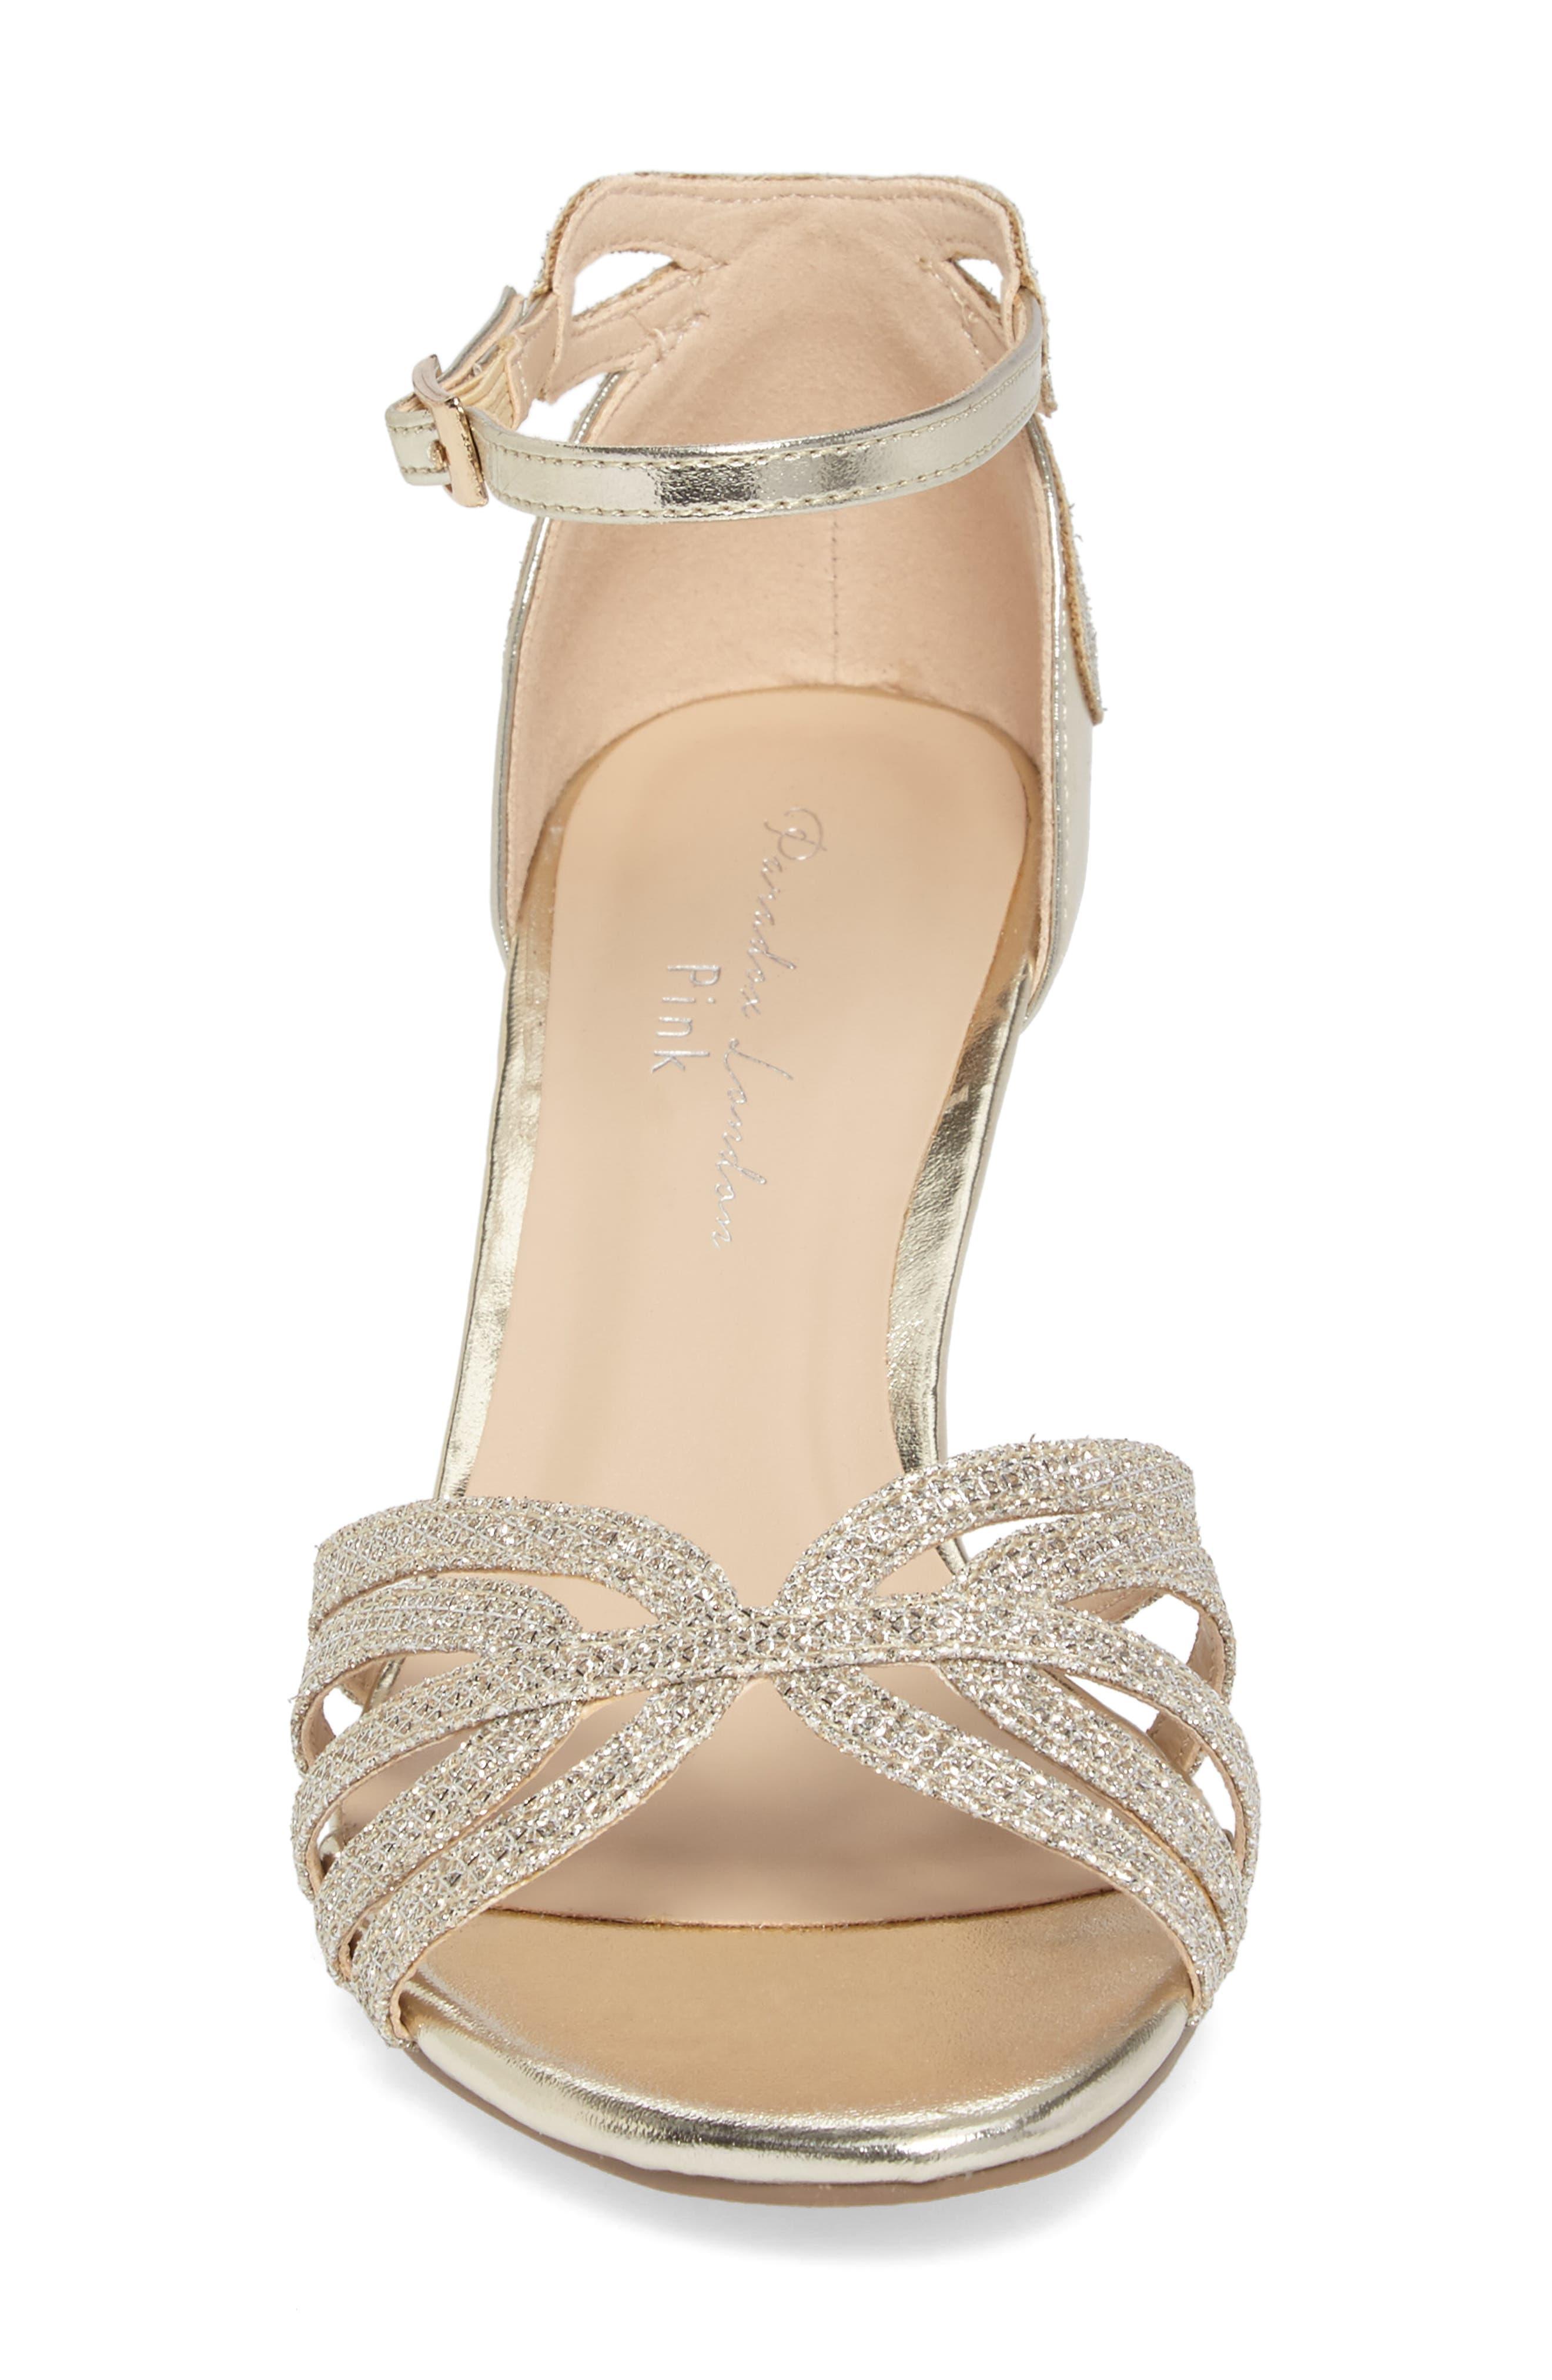 Melby Ankle Strap Sandal,                             Alternate thumbnail 4, color,                             Champagne